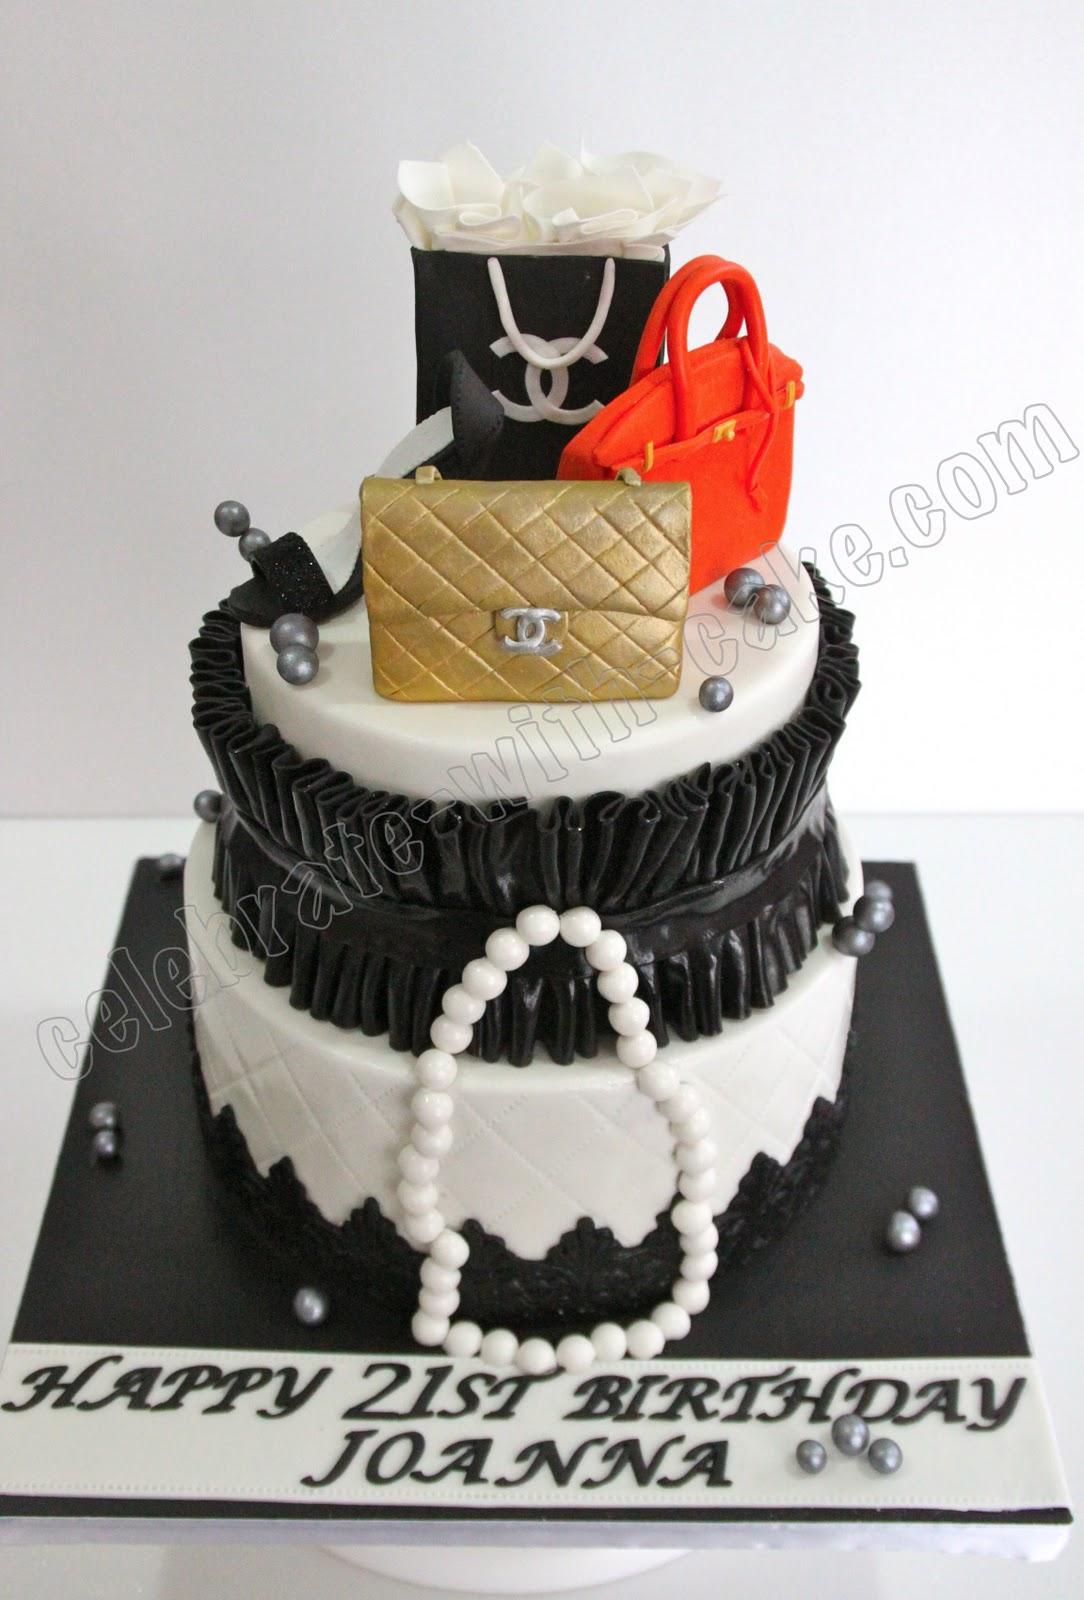 2 Tier Fashionista 21st Birthday Cake